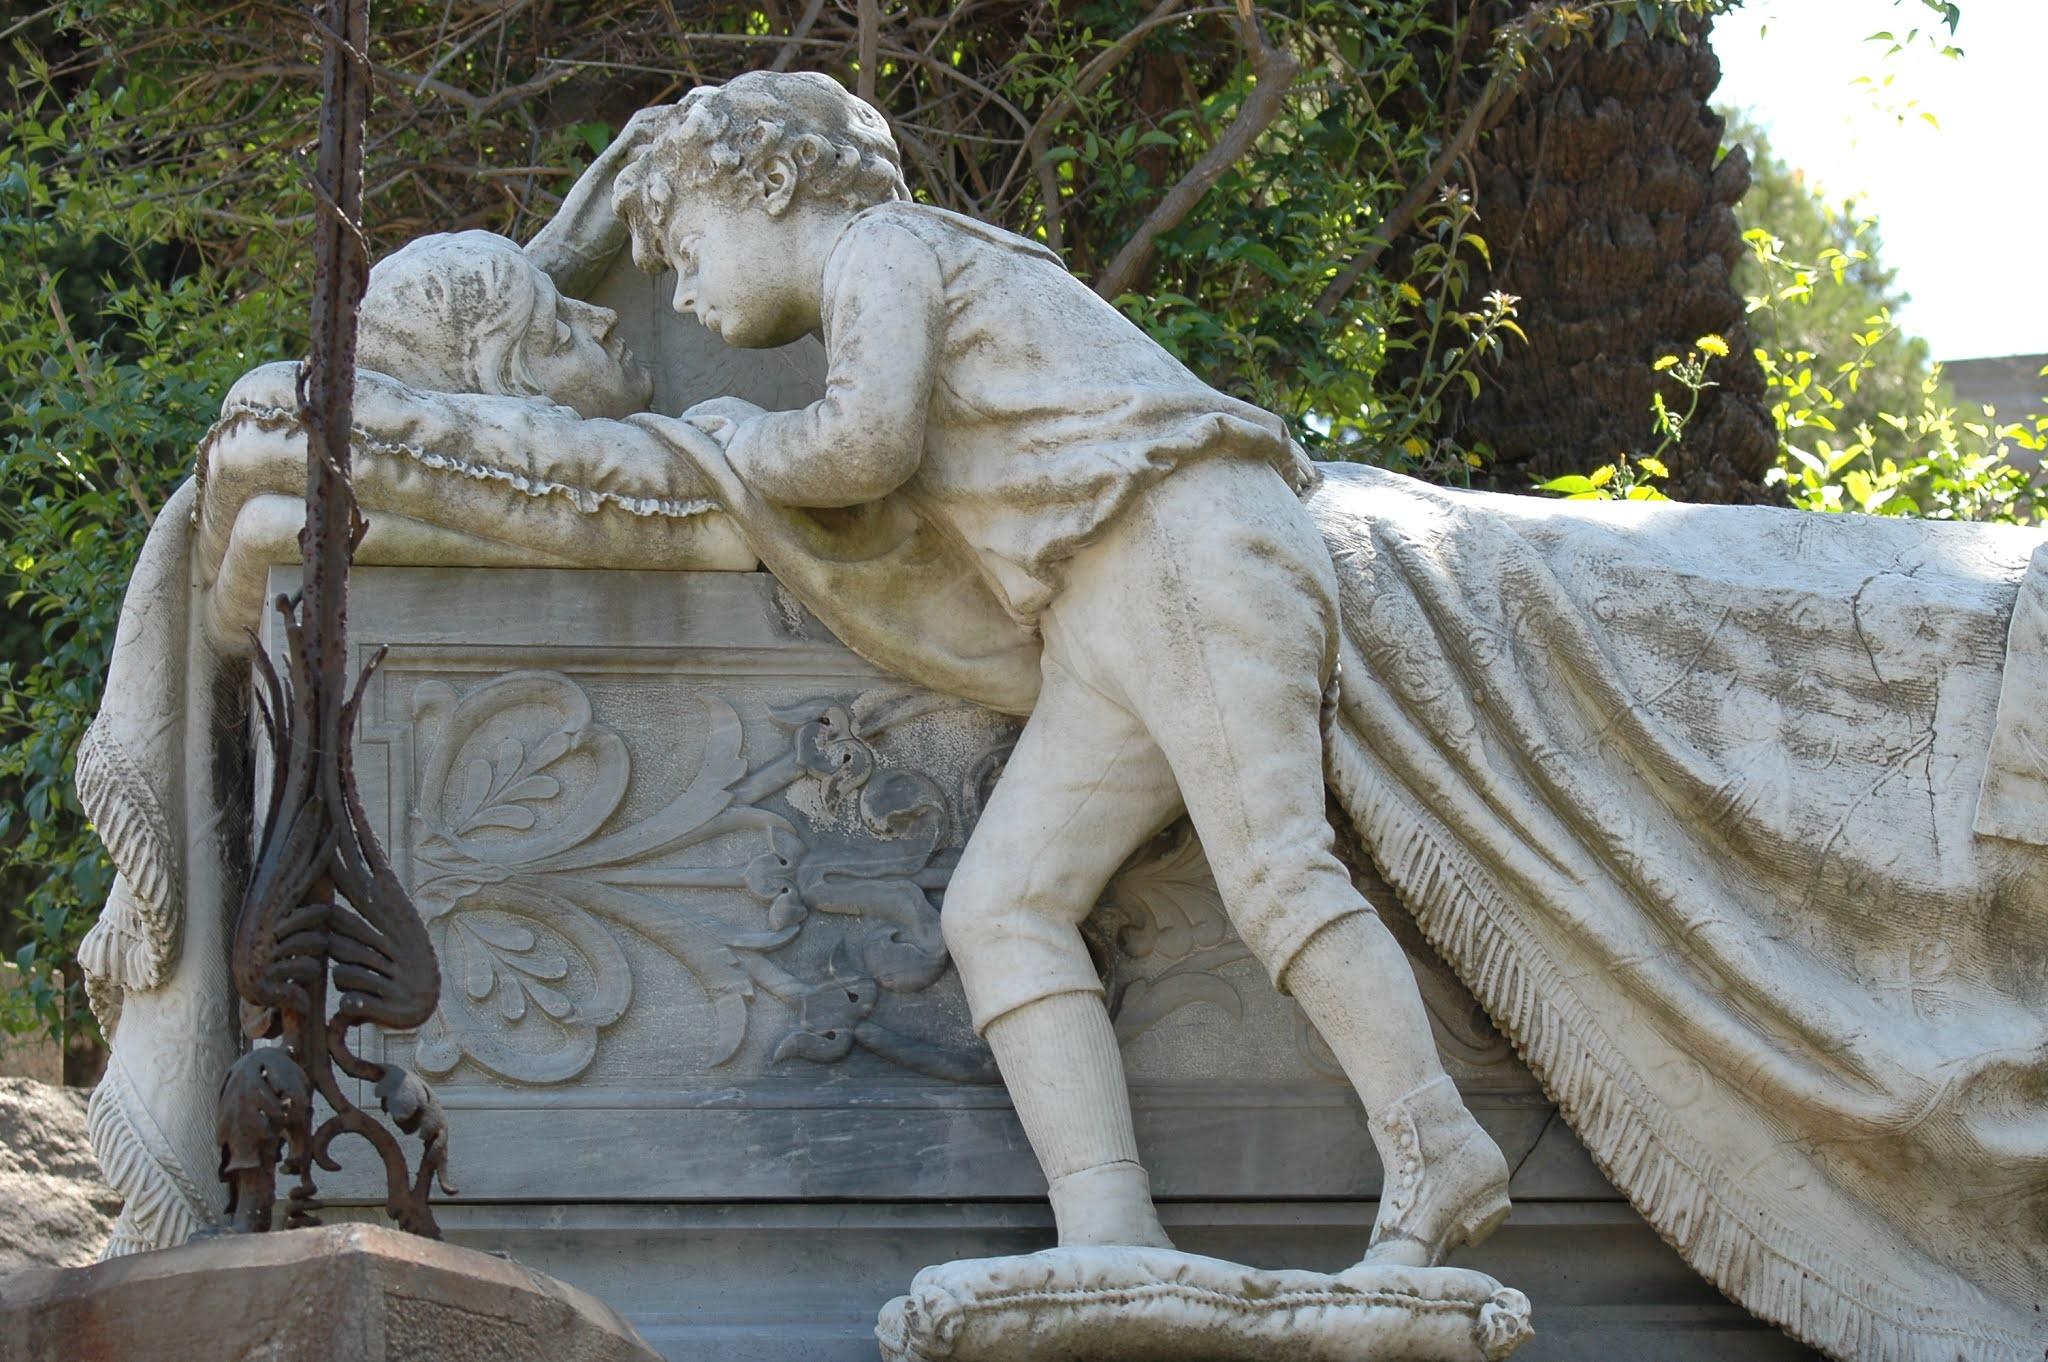 Monumental Cemetery of Bonaria (Cagliari, Italy)